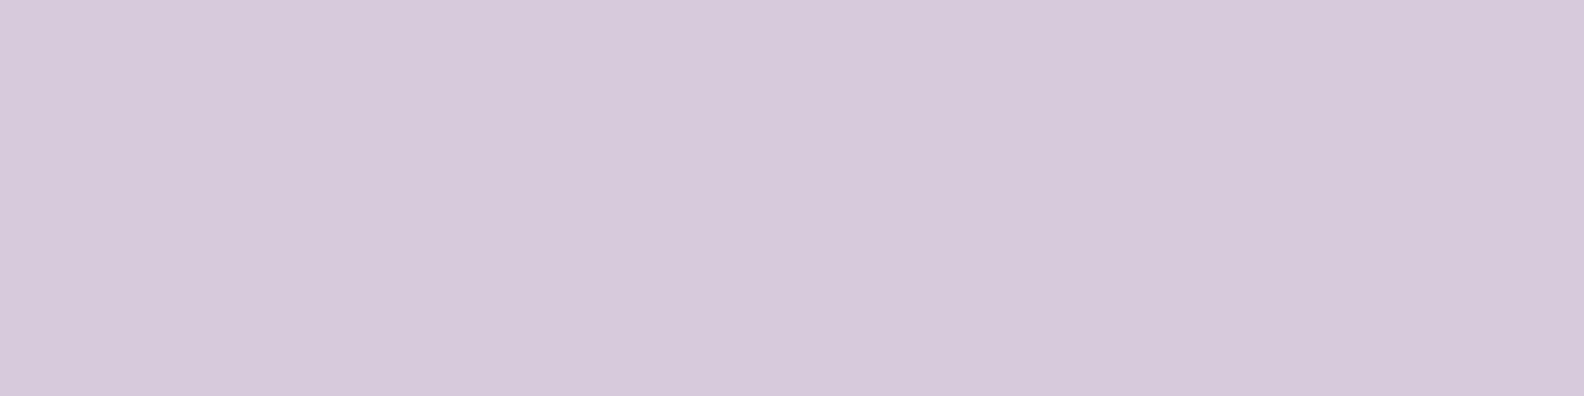 1584x396 Languid Lavender Solid Color Background